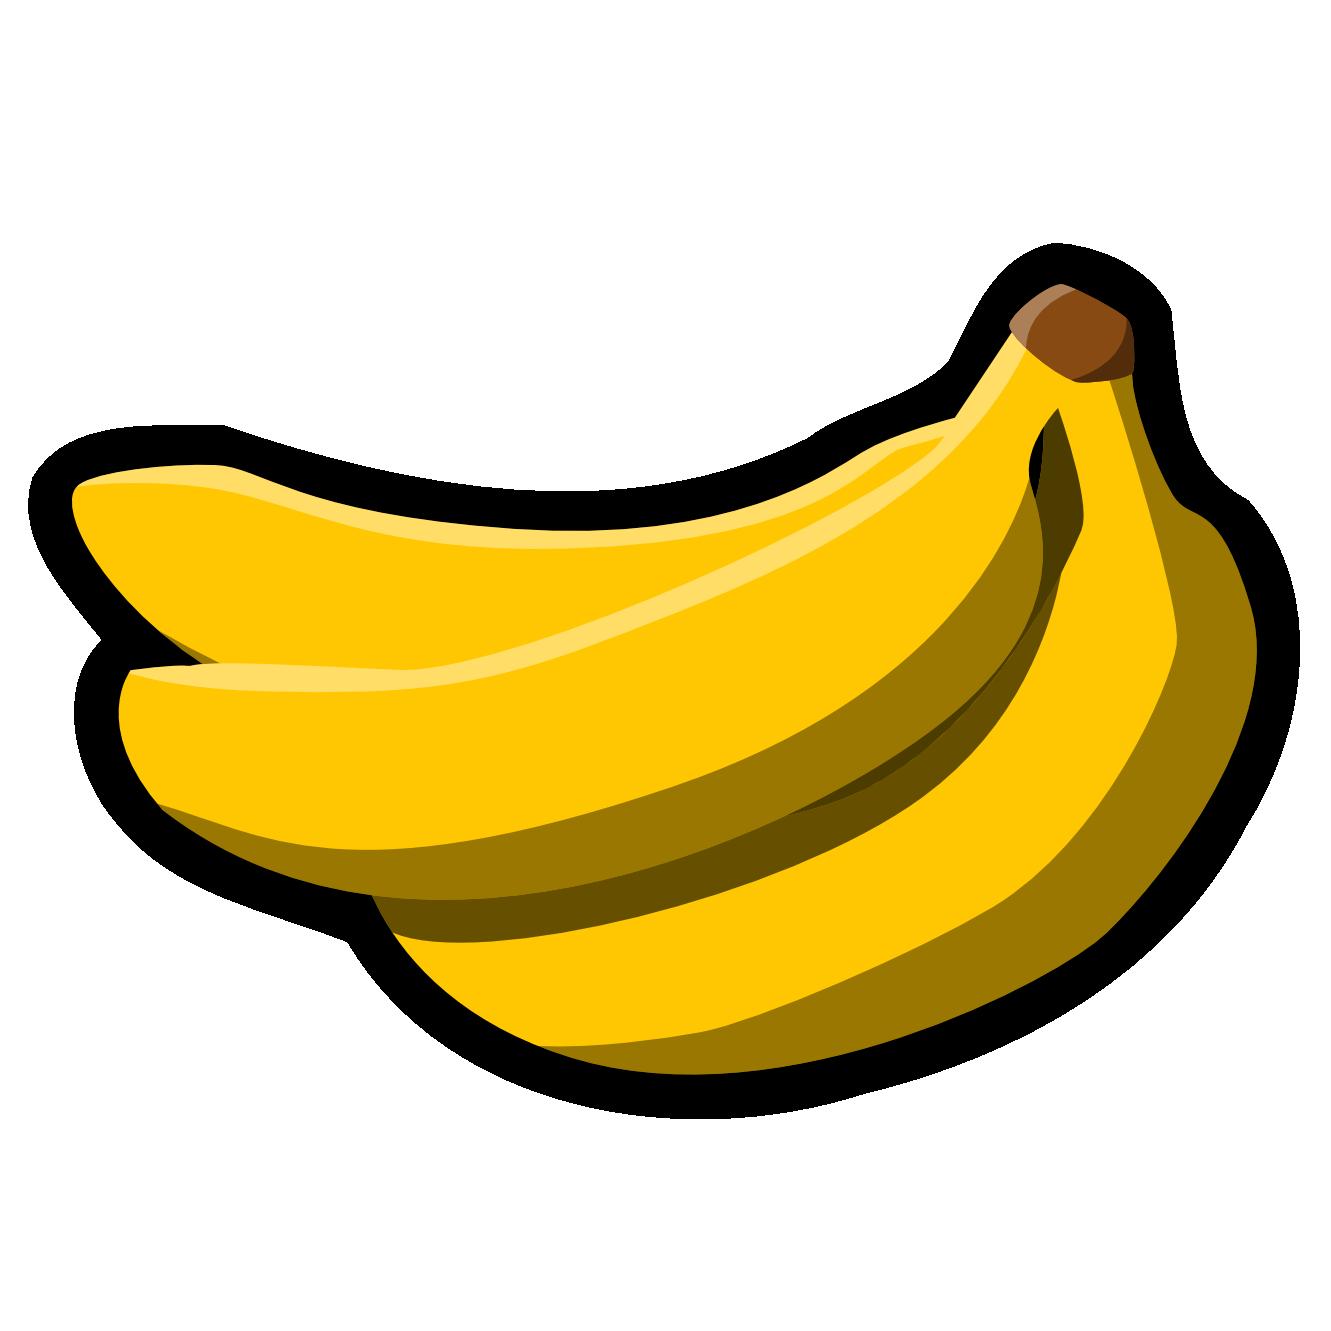 Banana clipart #8, Download drawings